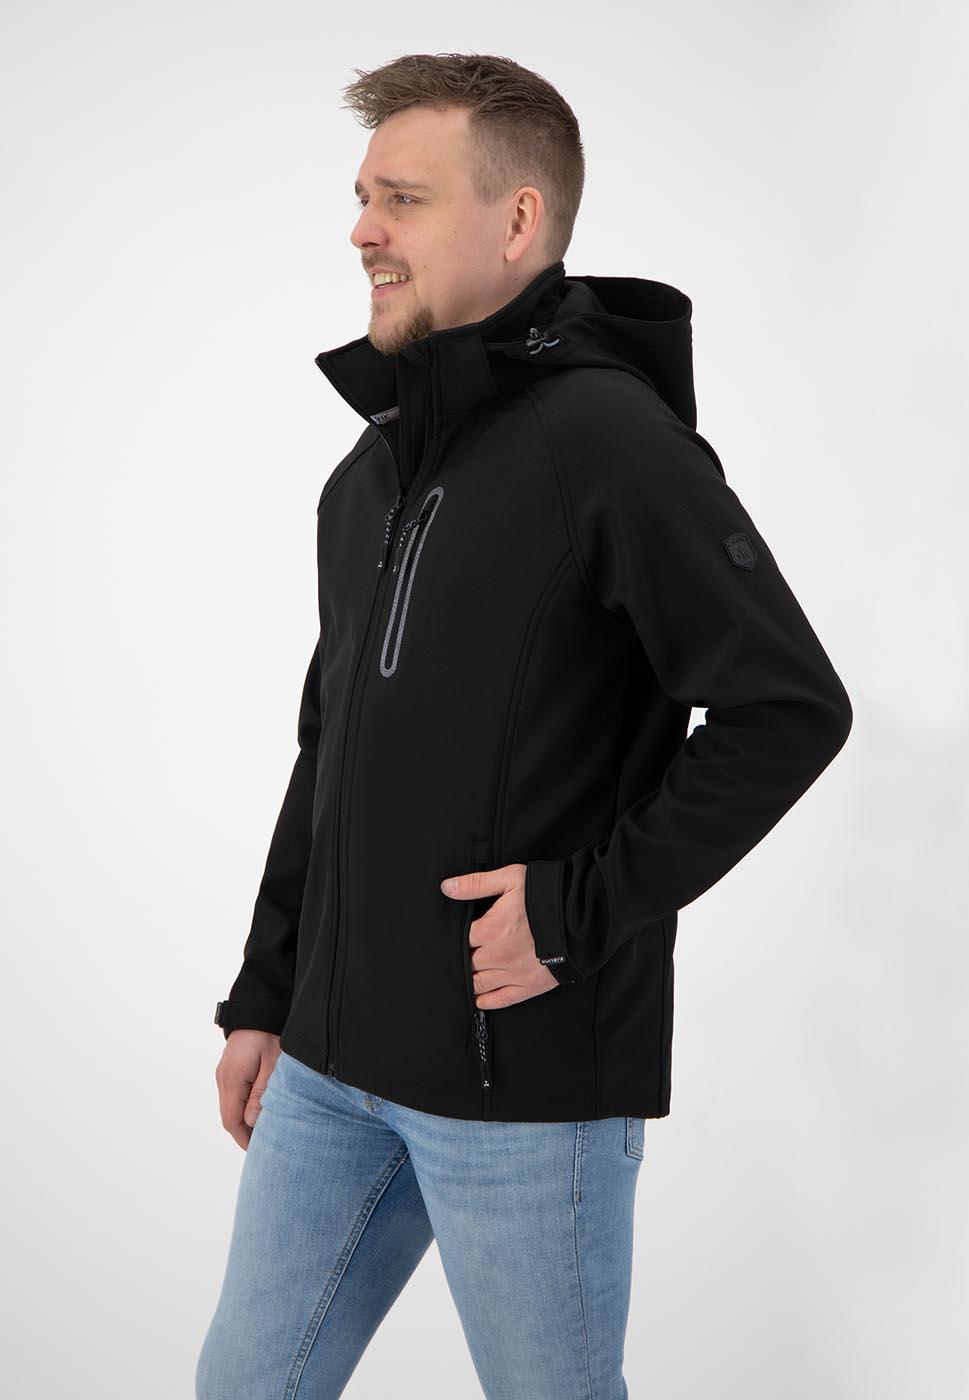 Kjelvik Scandinavian Clothing - Men Softshell Kevan Black